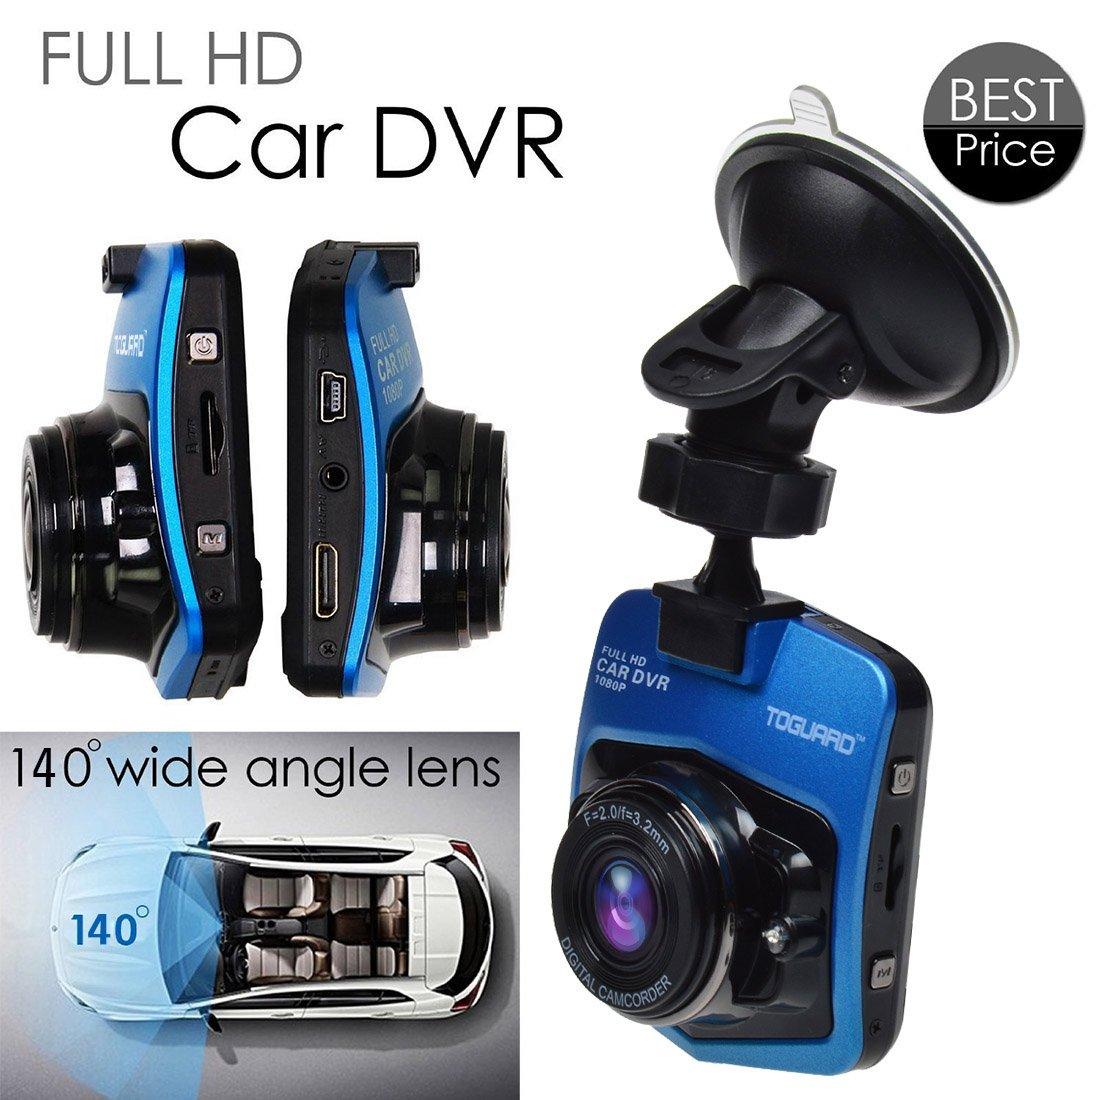 Amazon com toguard 2 46 lcd full hd 1080p dashcam car dvr camera novatek nt96220 g sensor parking monitor motion detection loop recording night vision